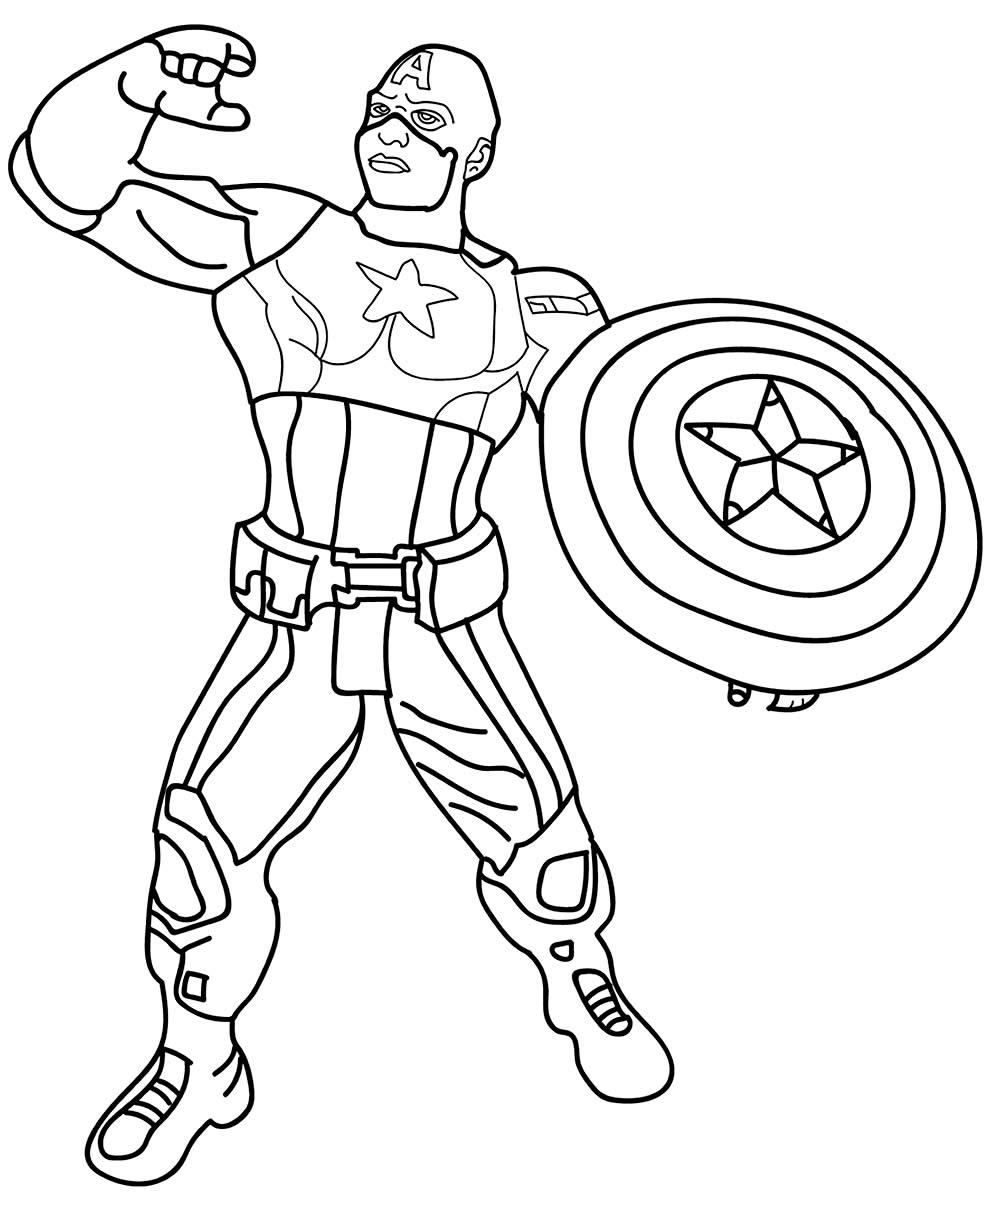 Superbe dessin de Captain America